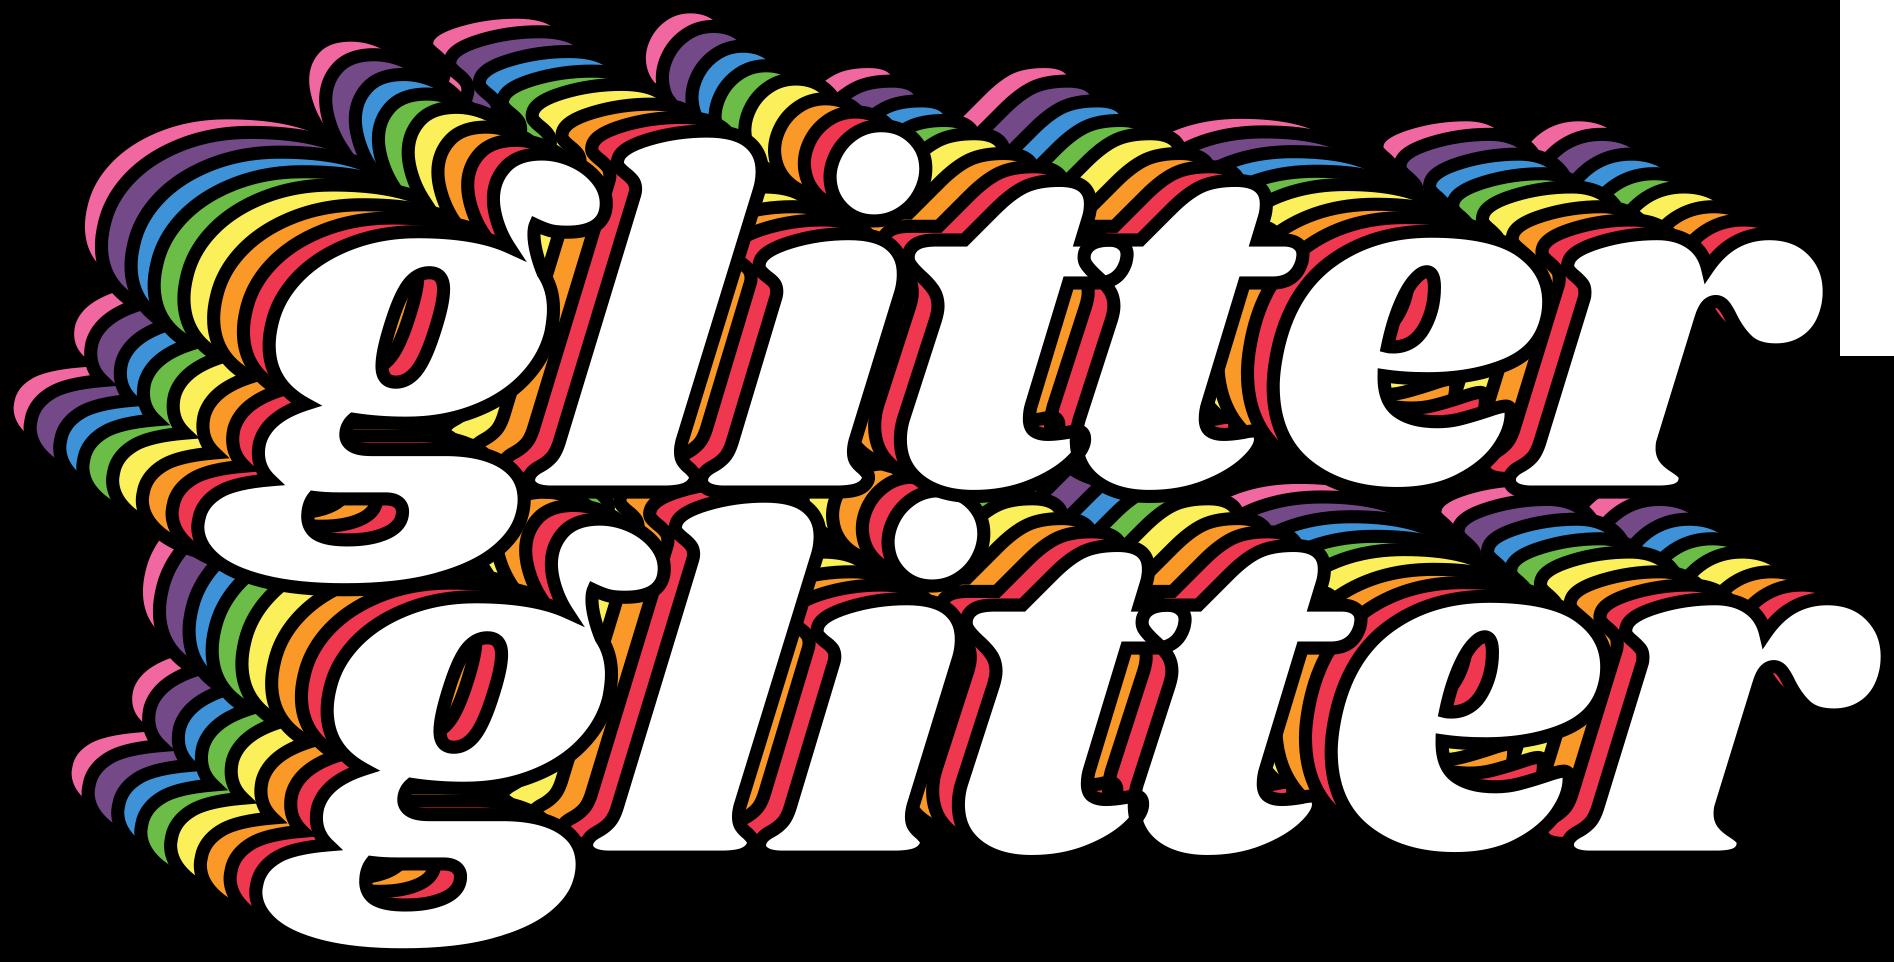 Glitter Glitter Co.